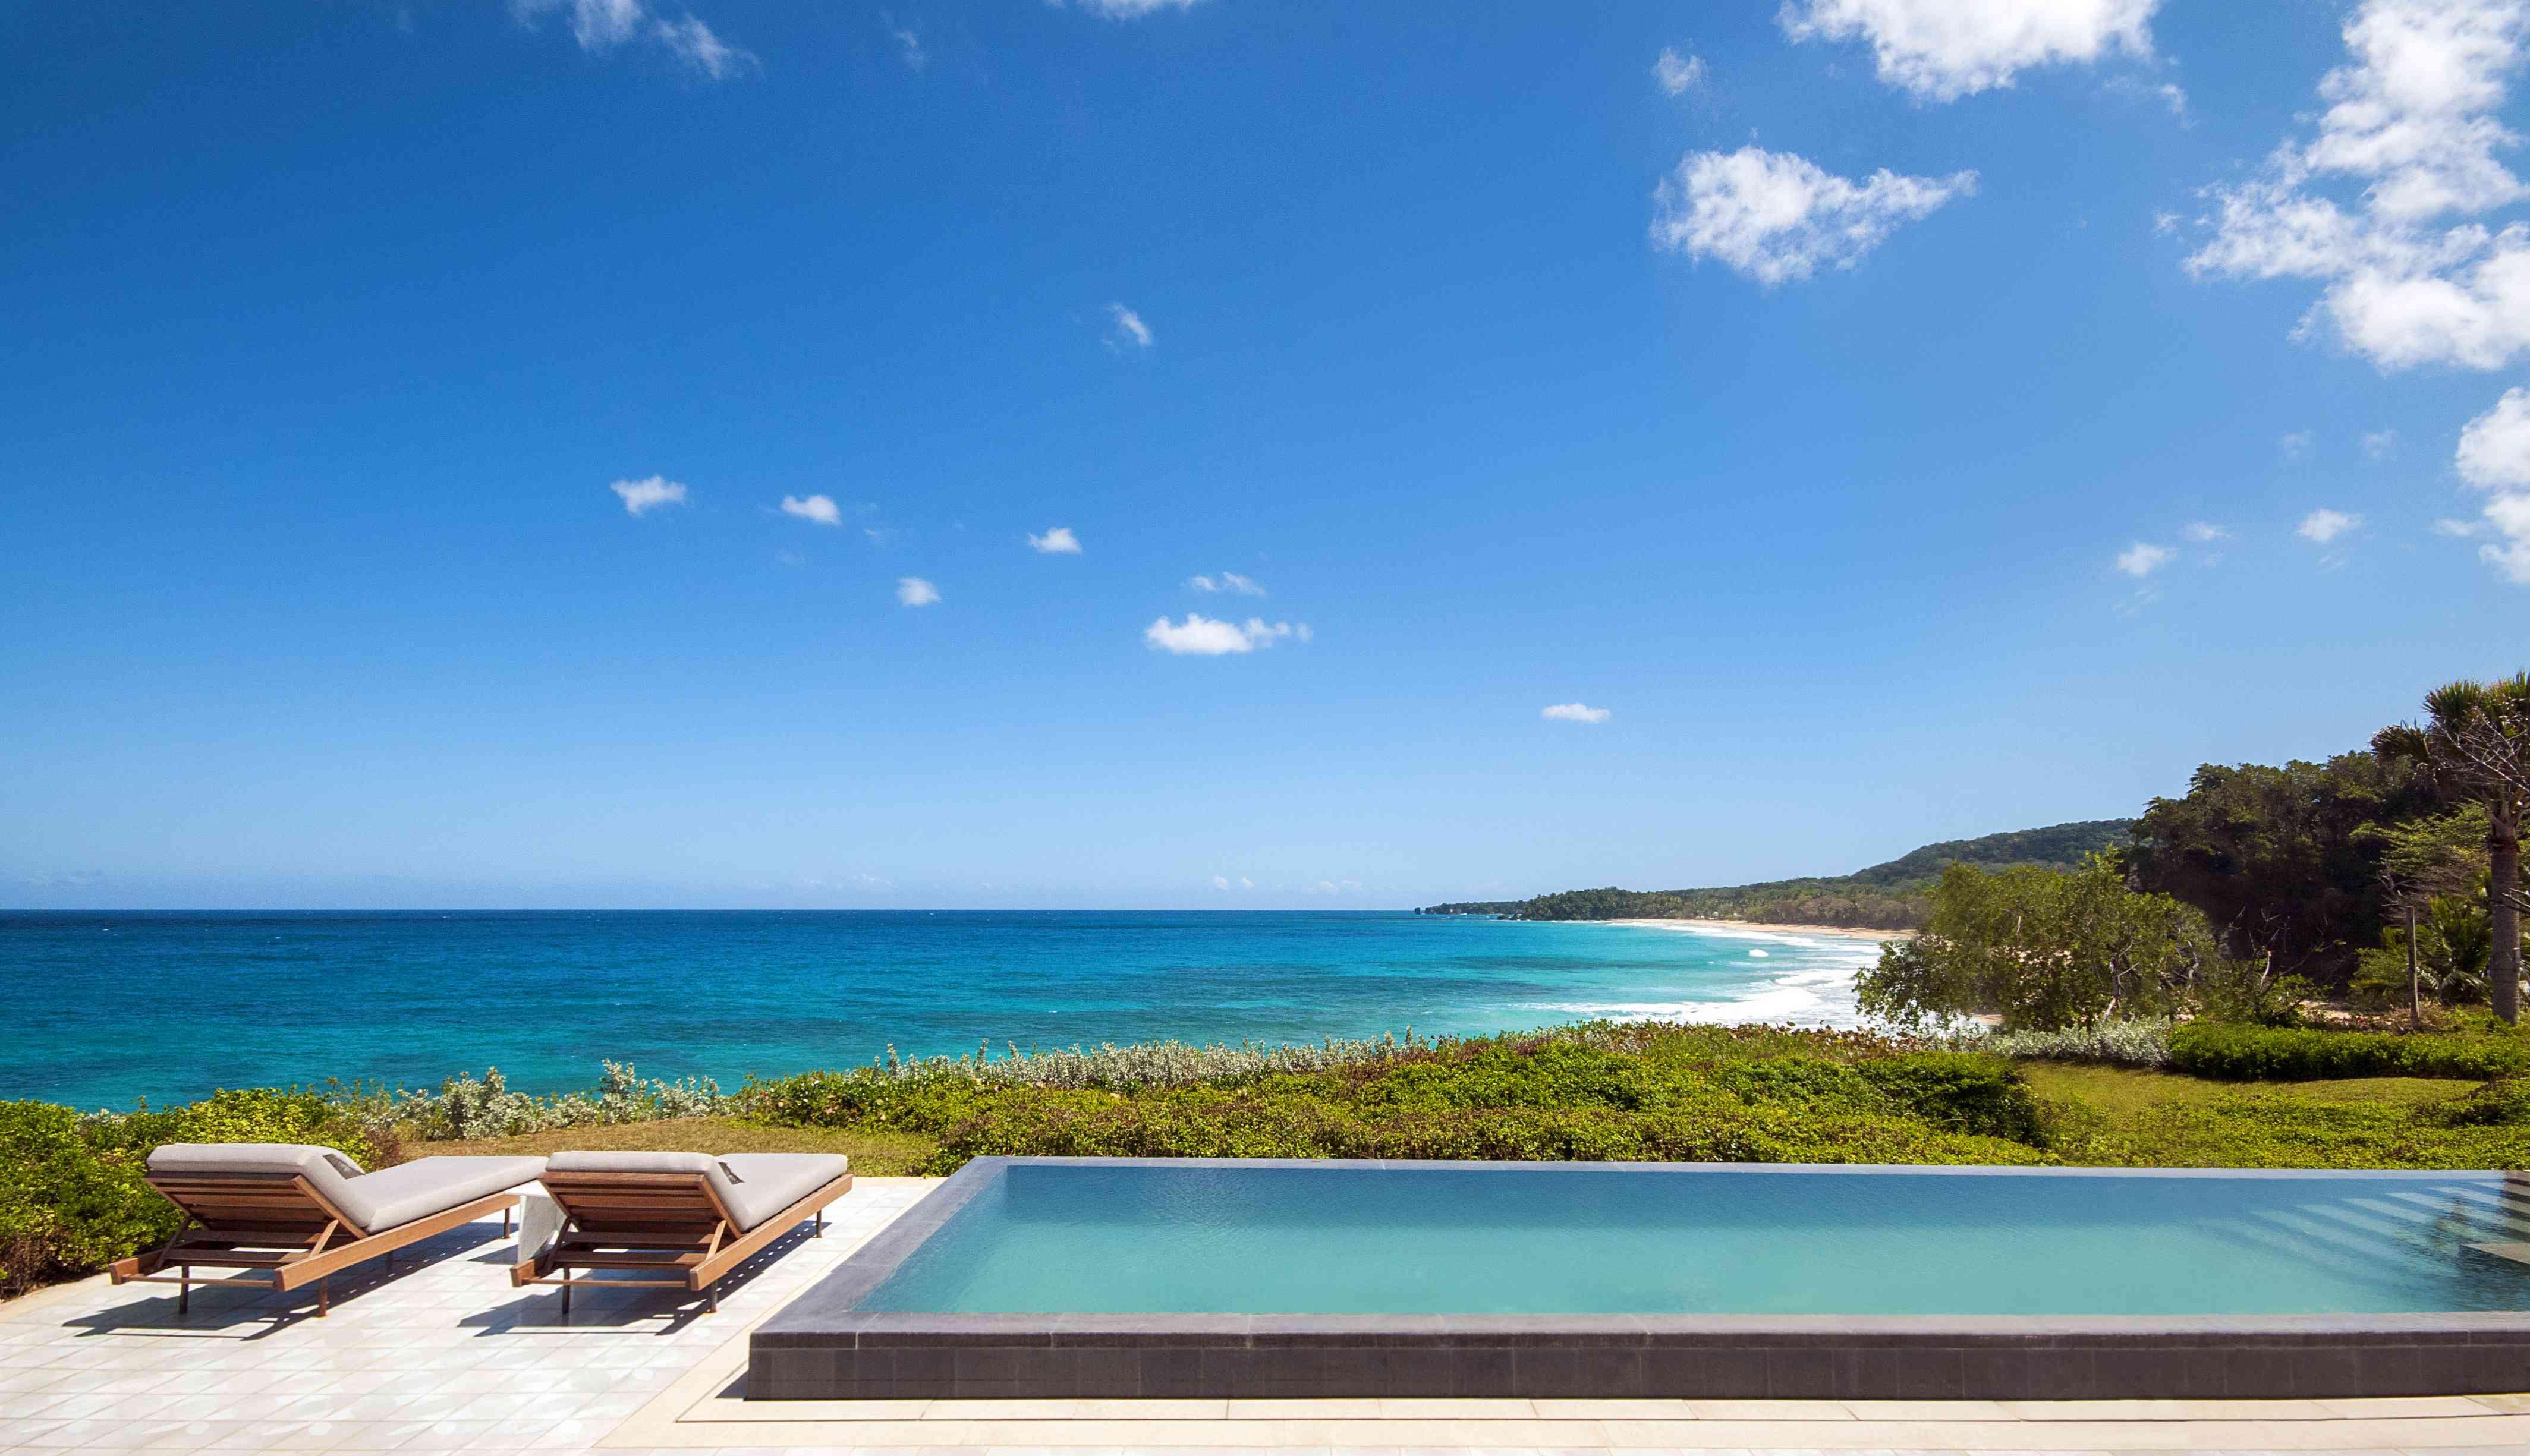 A Casita pool at Amanera Resort in the Dominican Republic